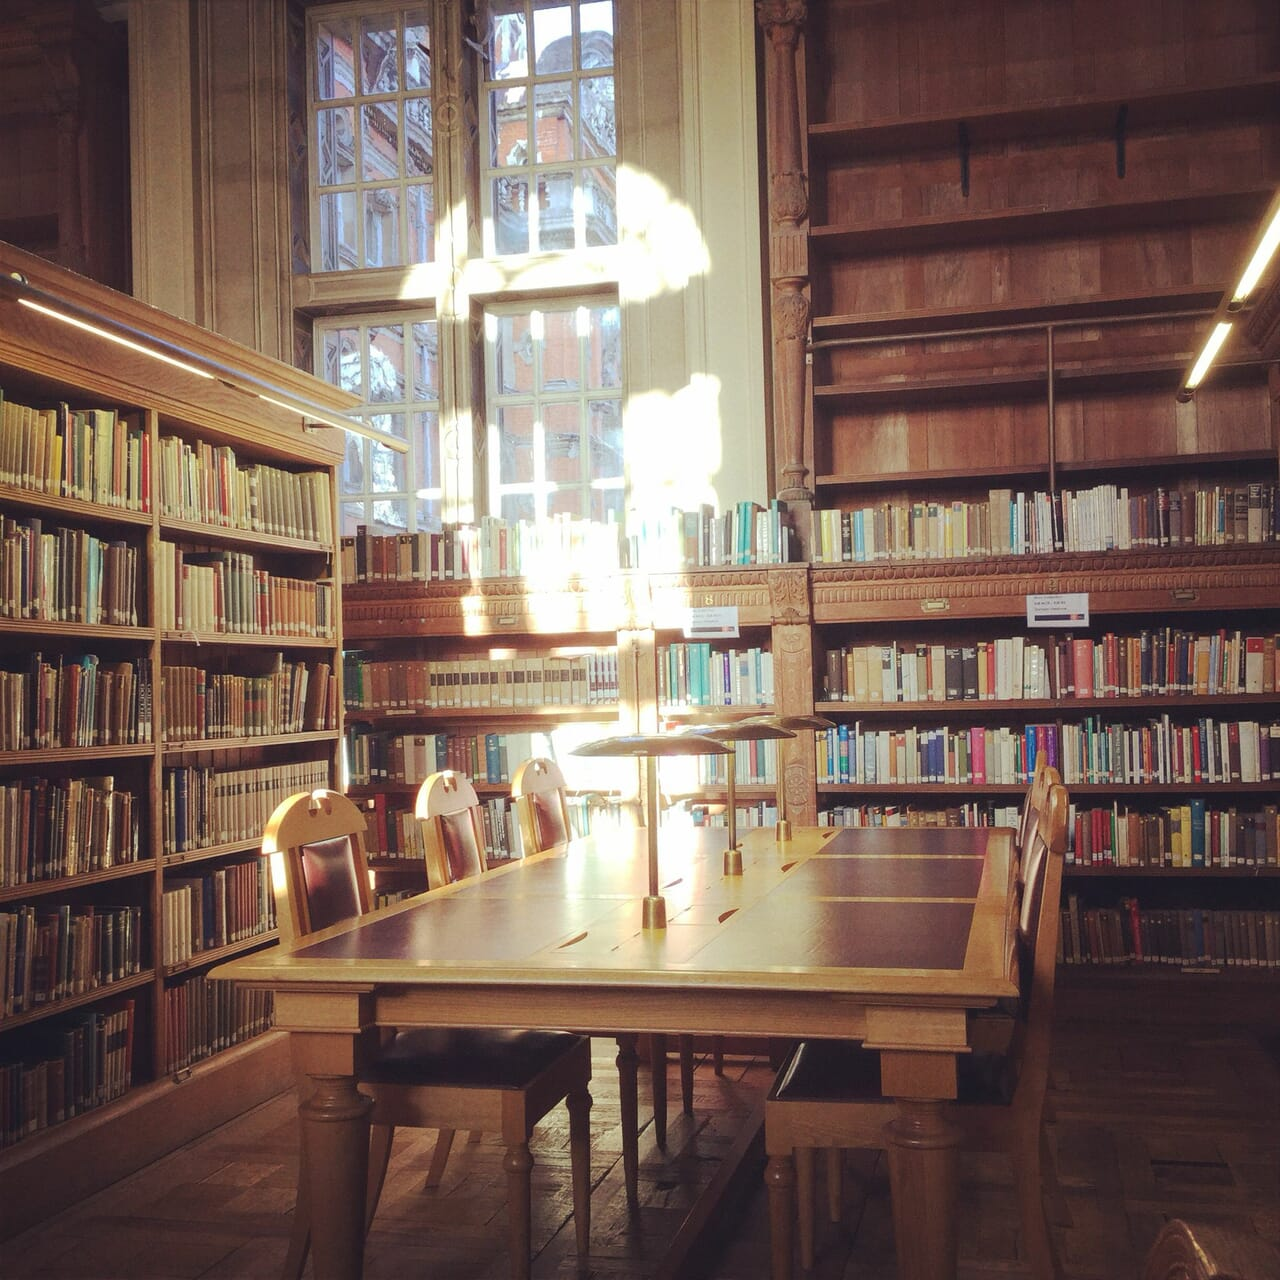 library, universityoflondon, and founderslibrary image